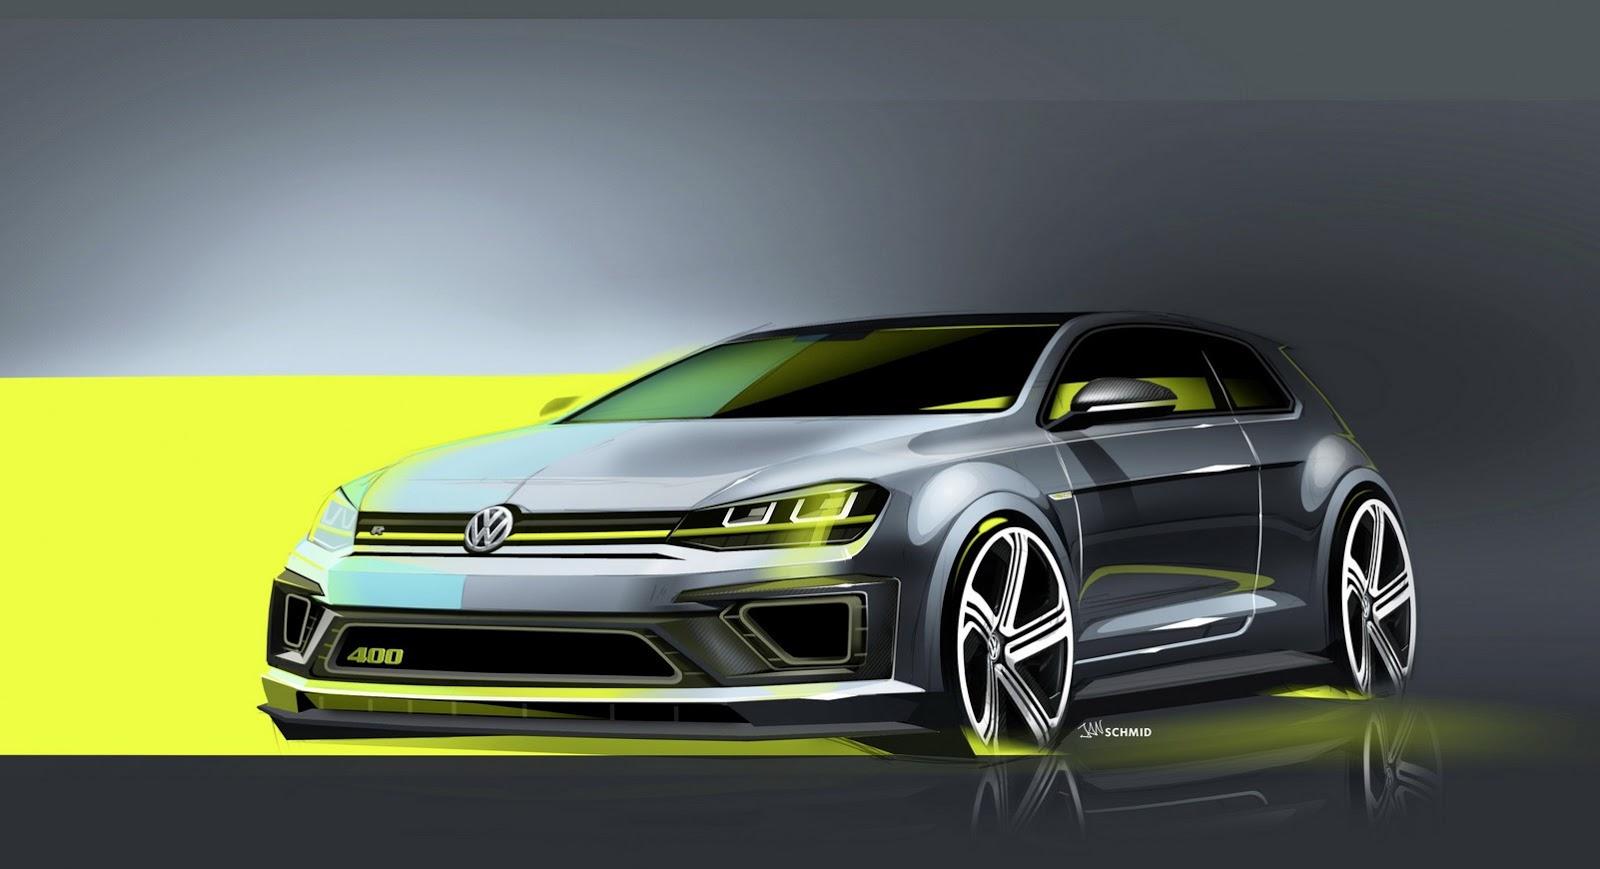 volkswagen golf r with 400 hp to make debut in beijing autoevolution. Black Bedroom Furniture Sets. Home Design Ideas